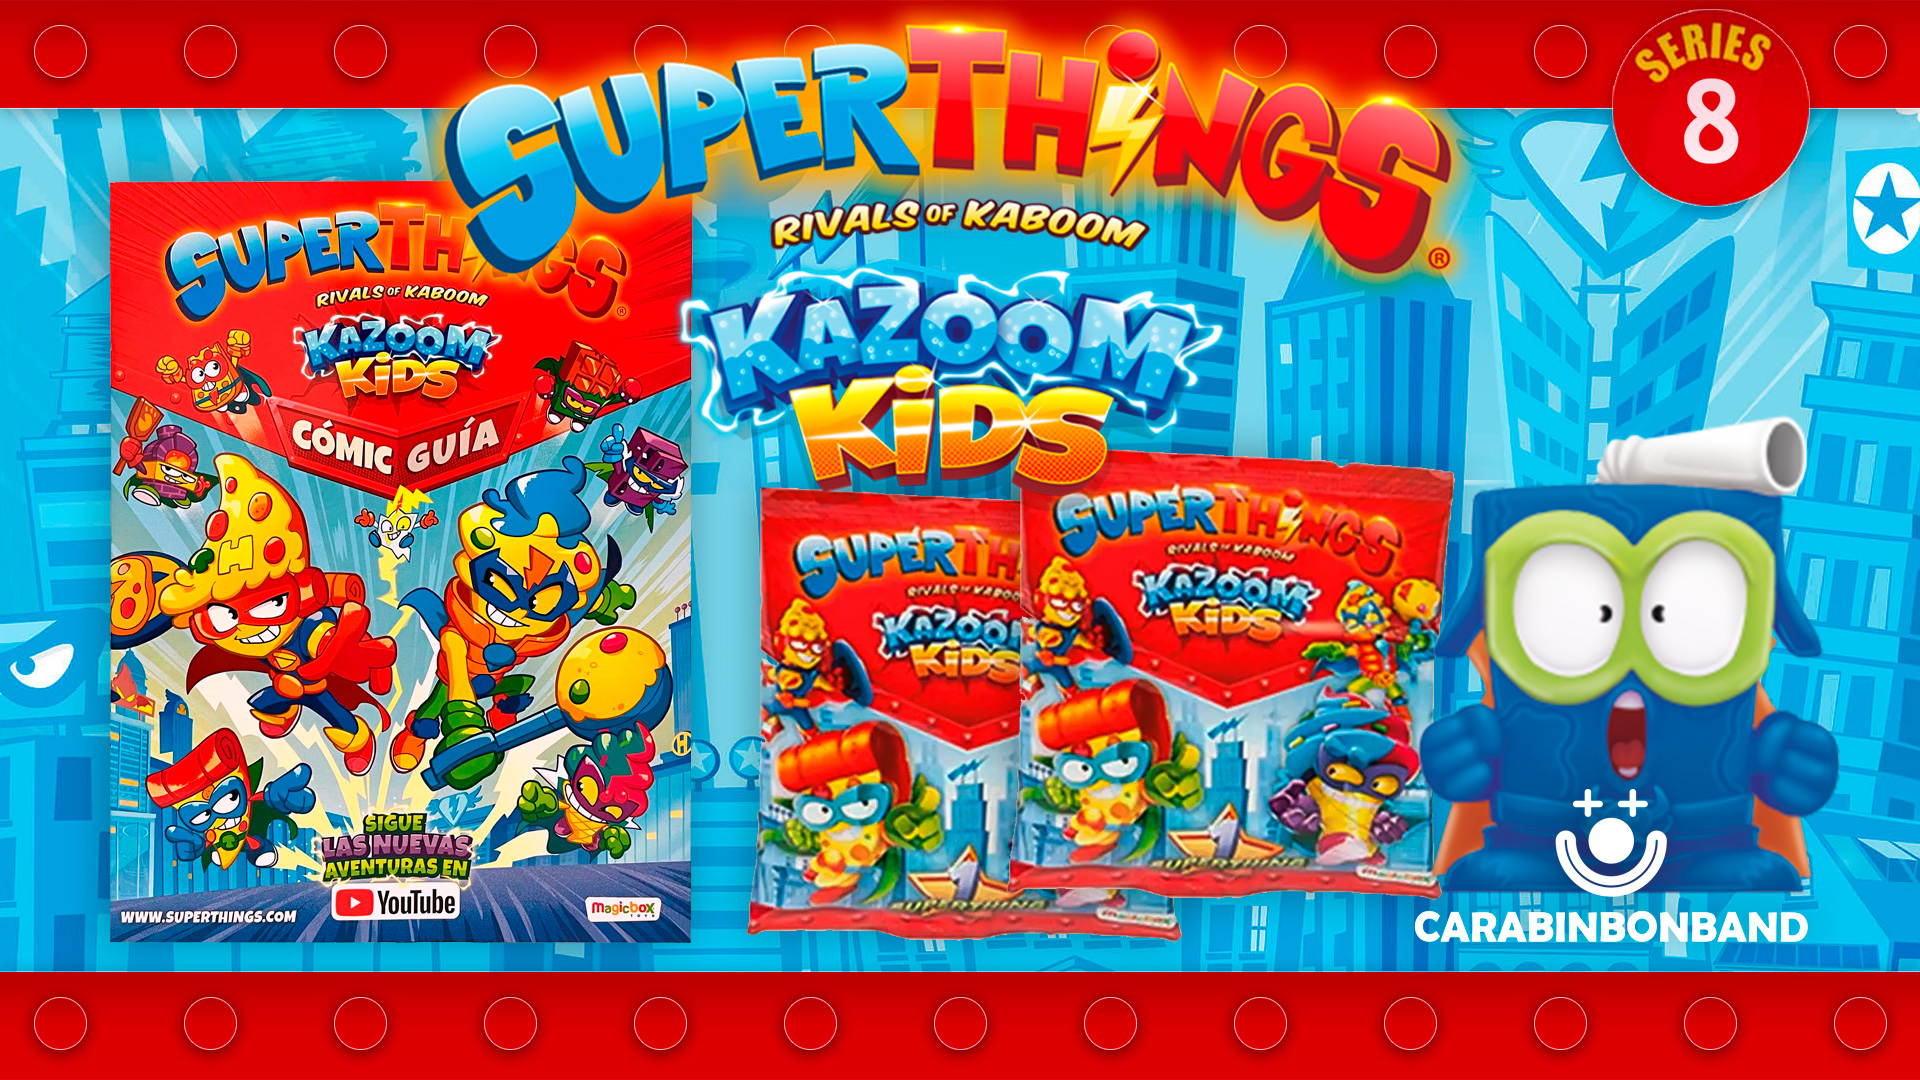 SUPERZINGS SERIES 8 COMIC GUIA - SUPERTHINGS KAZOOM KIDS - By CARA BIN BON BAND